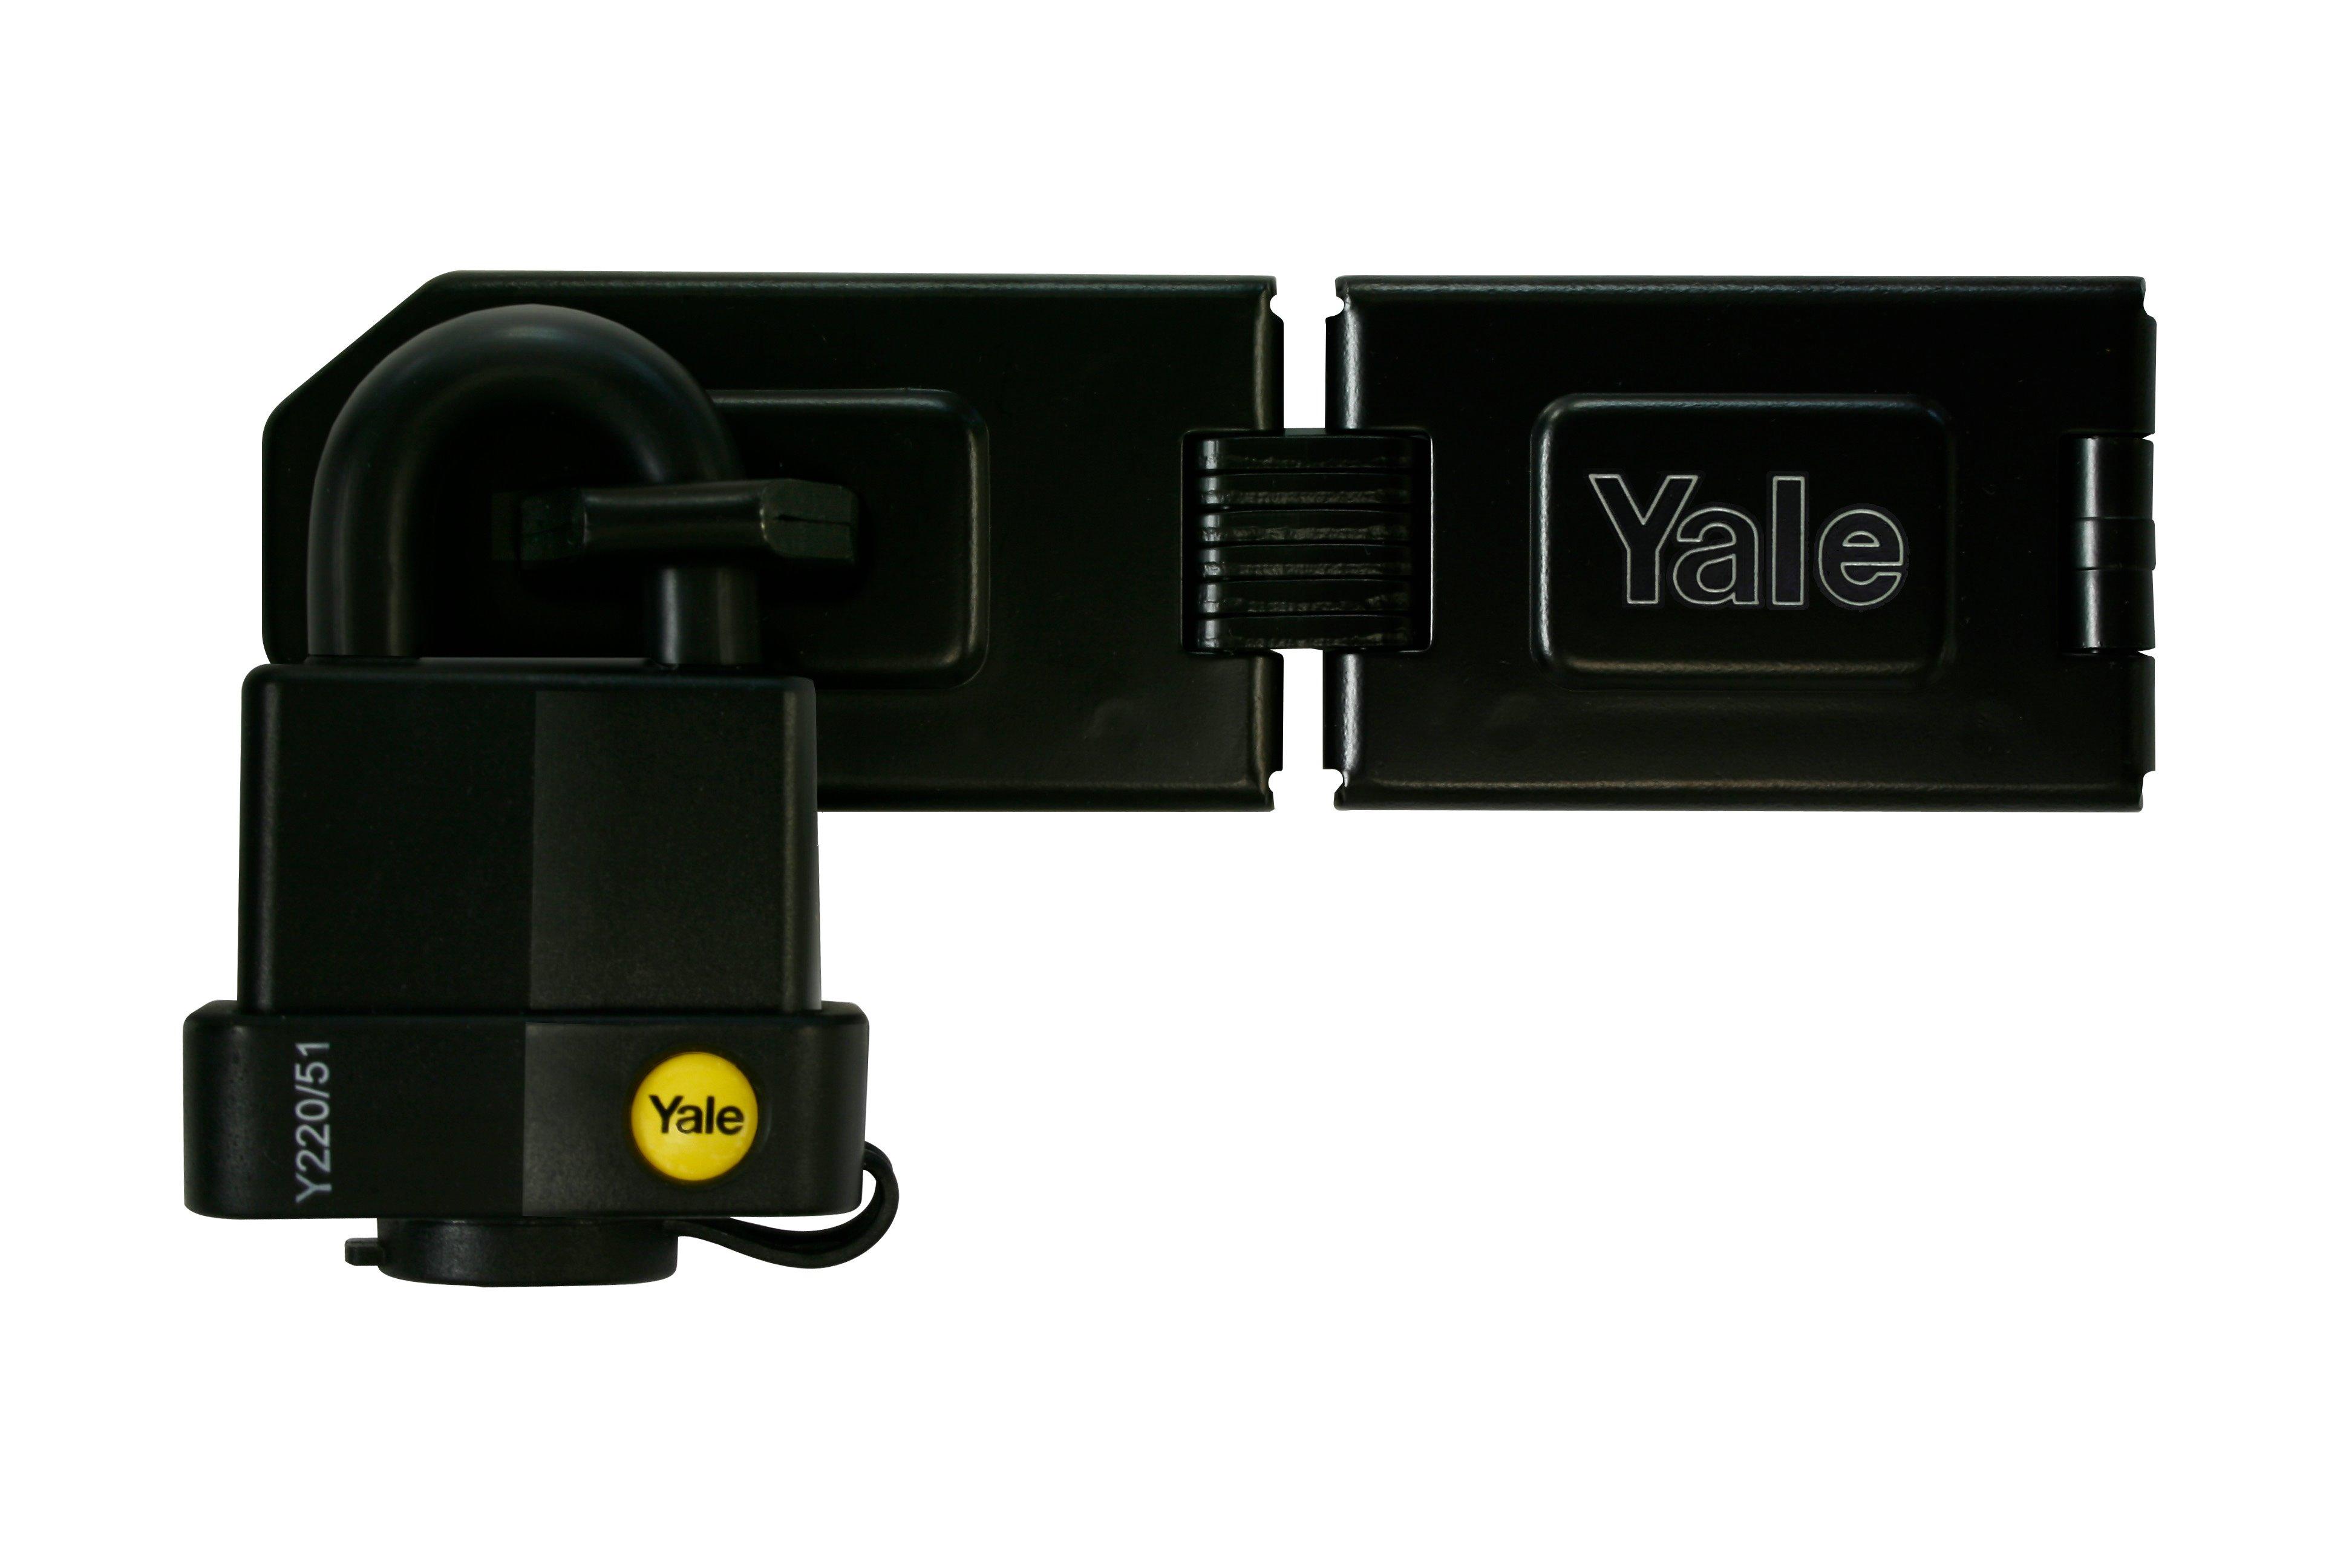 Y220 Hasp Steel Black Finish With Weatherproof Padlock